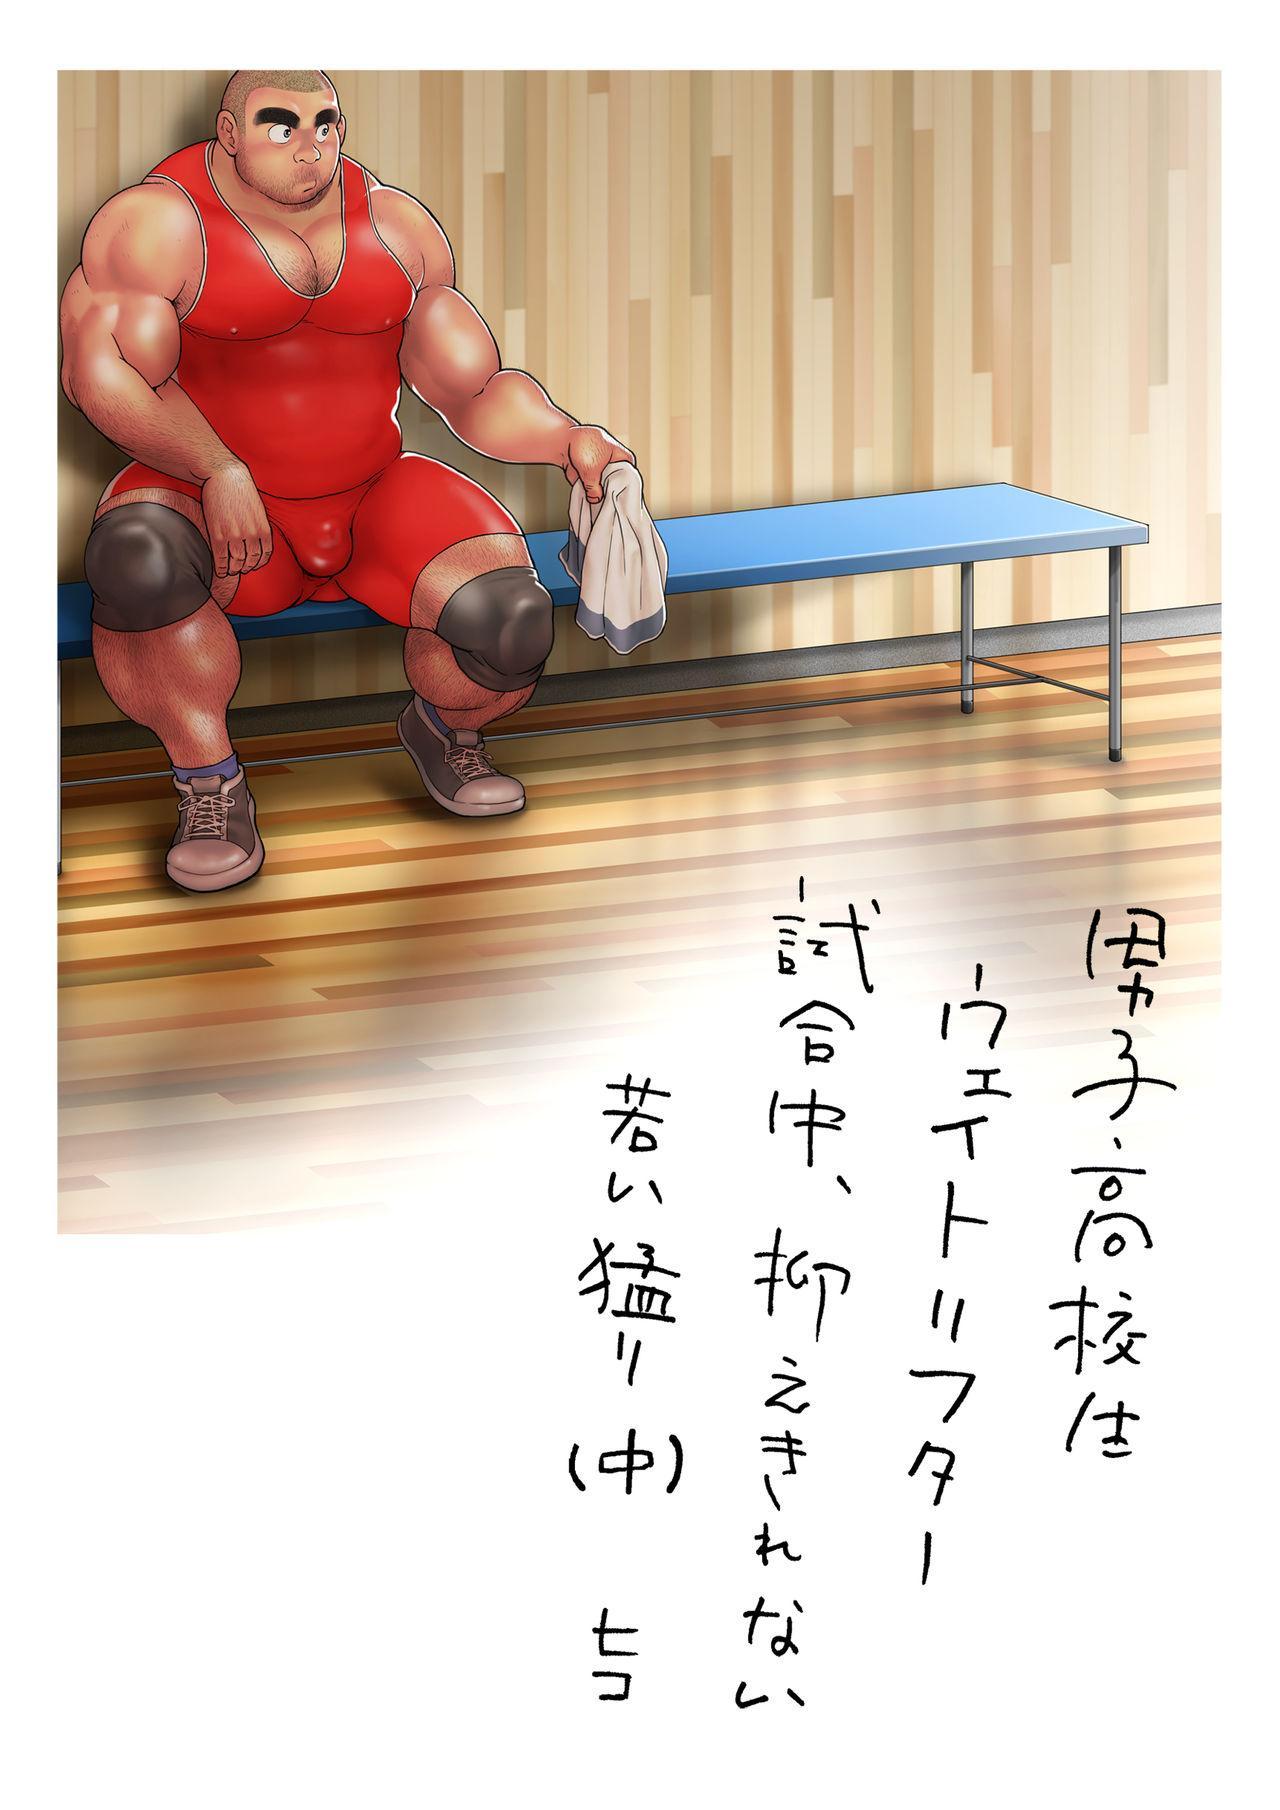 Danshi Koukousei Weightlifter Shiai-chuu, Osae kirenai Wakai Takeri 36